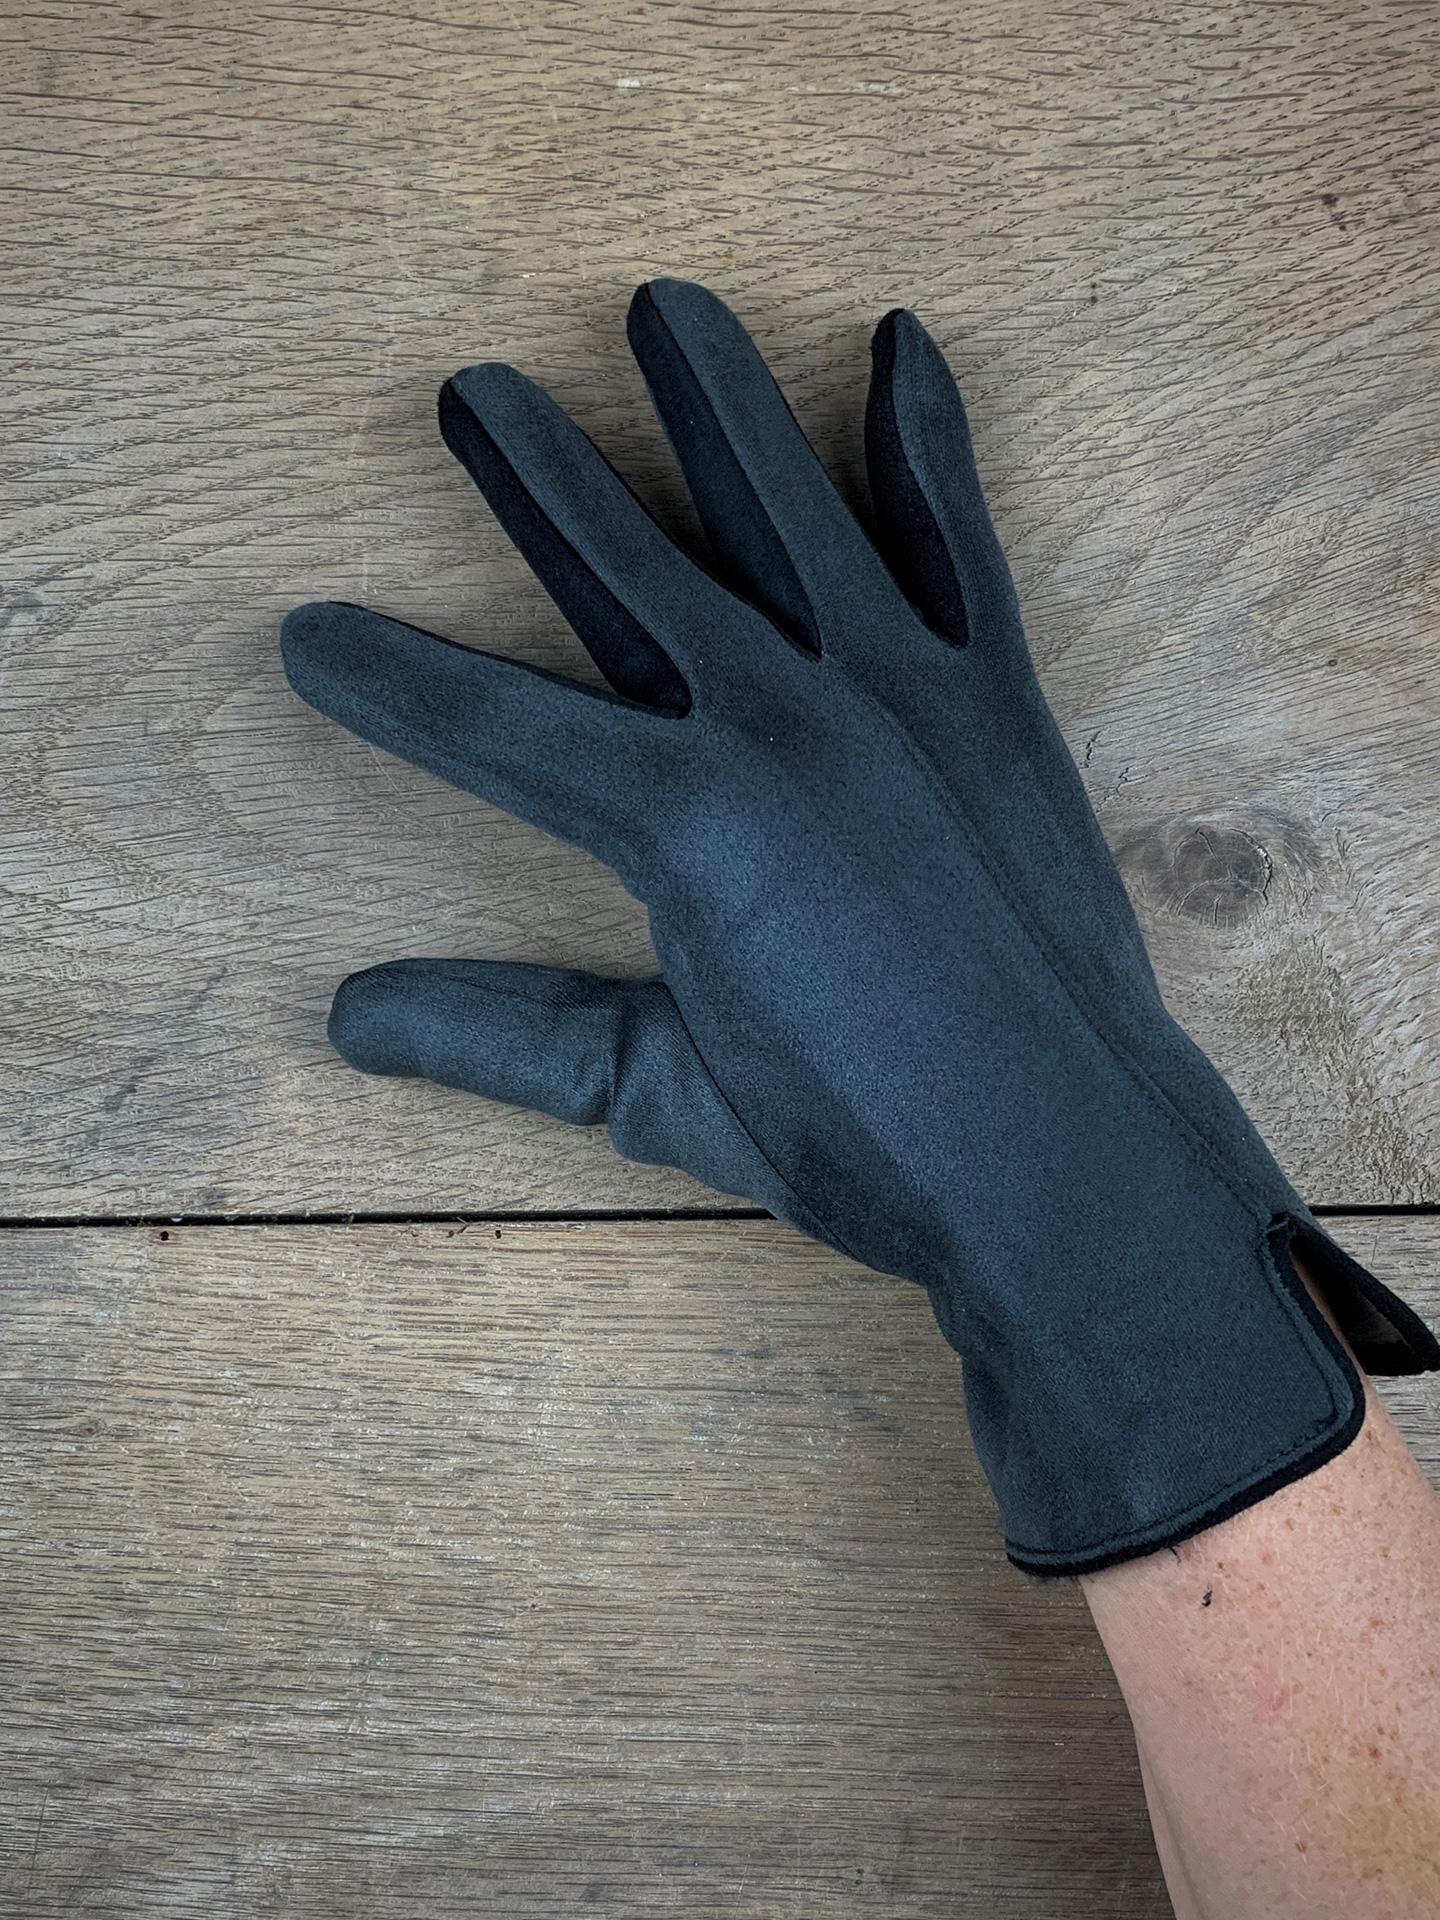 Damenhandschuhe zweifarbig grau/schwarz